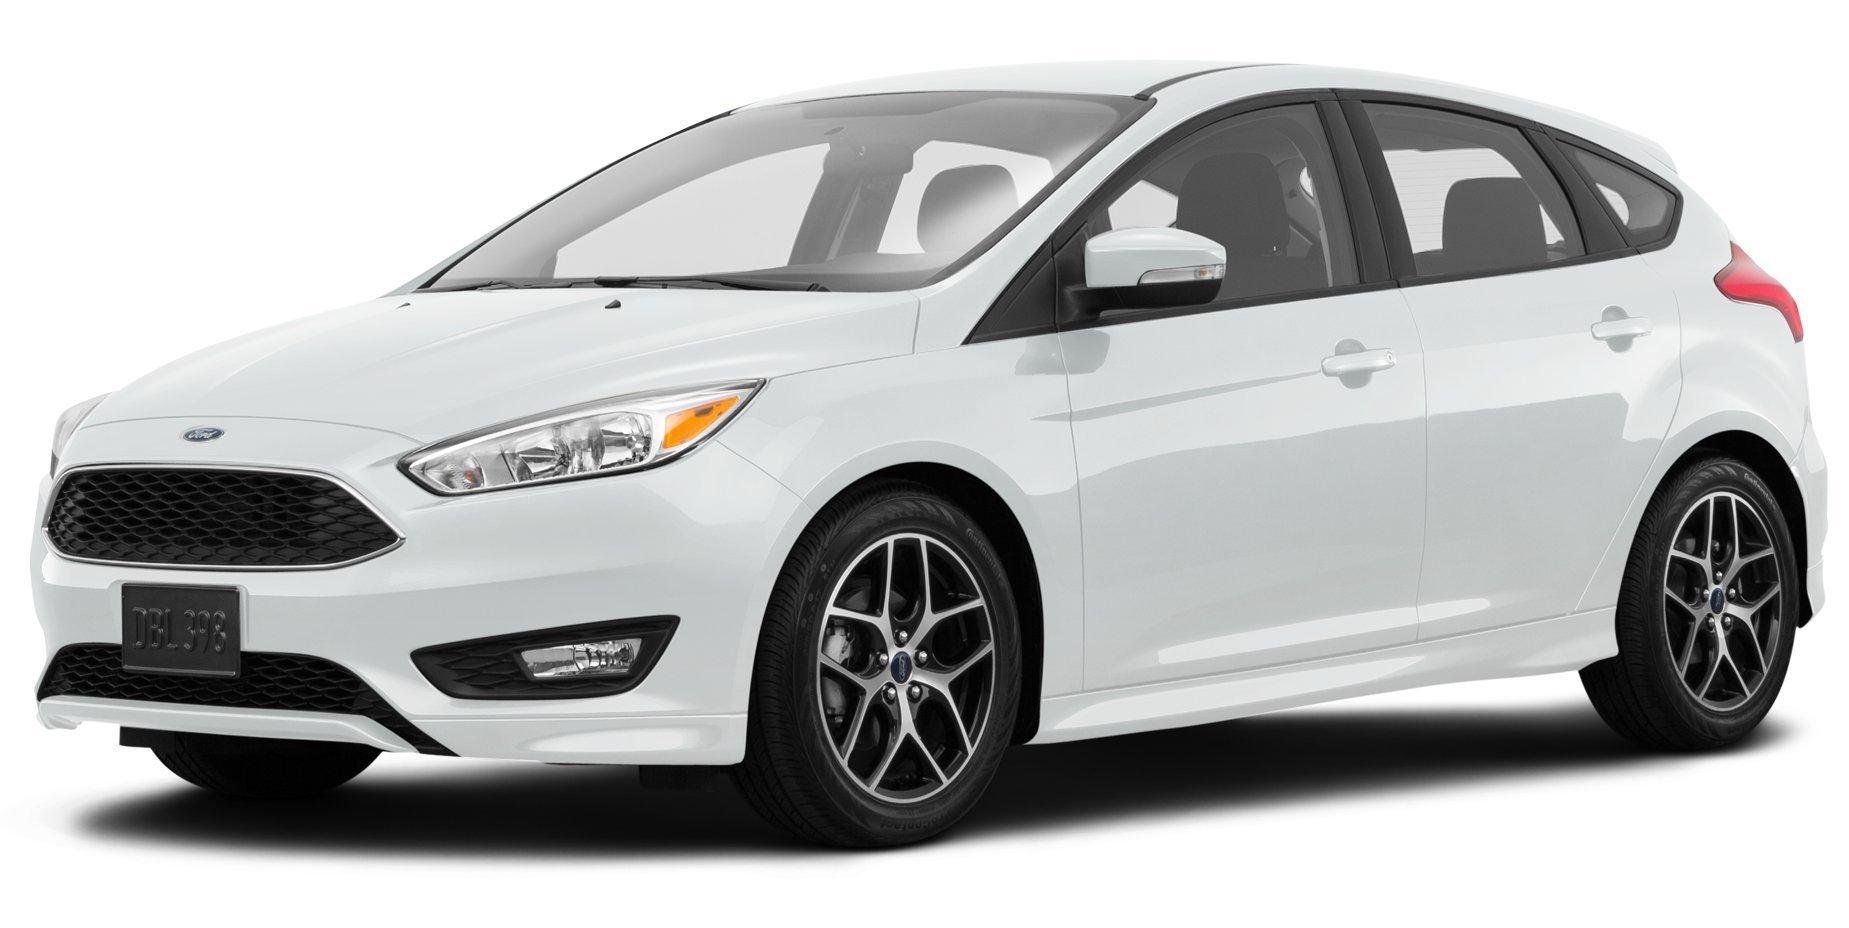 Amazon.com: 2017 Hyundai Sonata Reviews, Images, and Specs ...